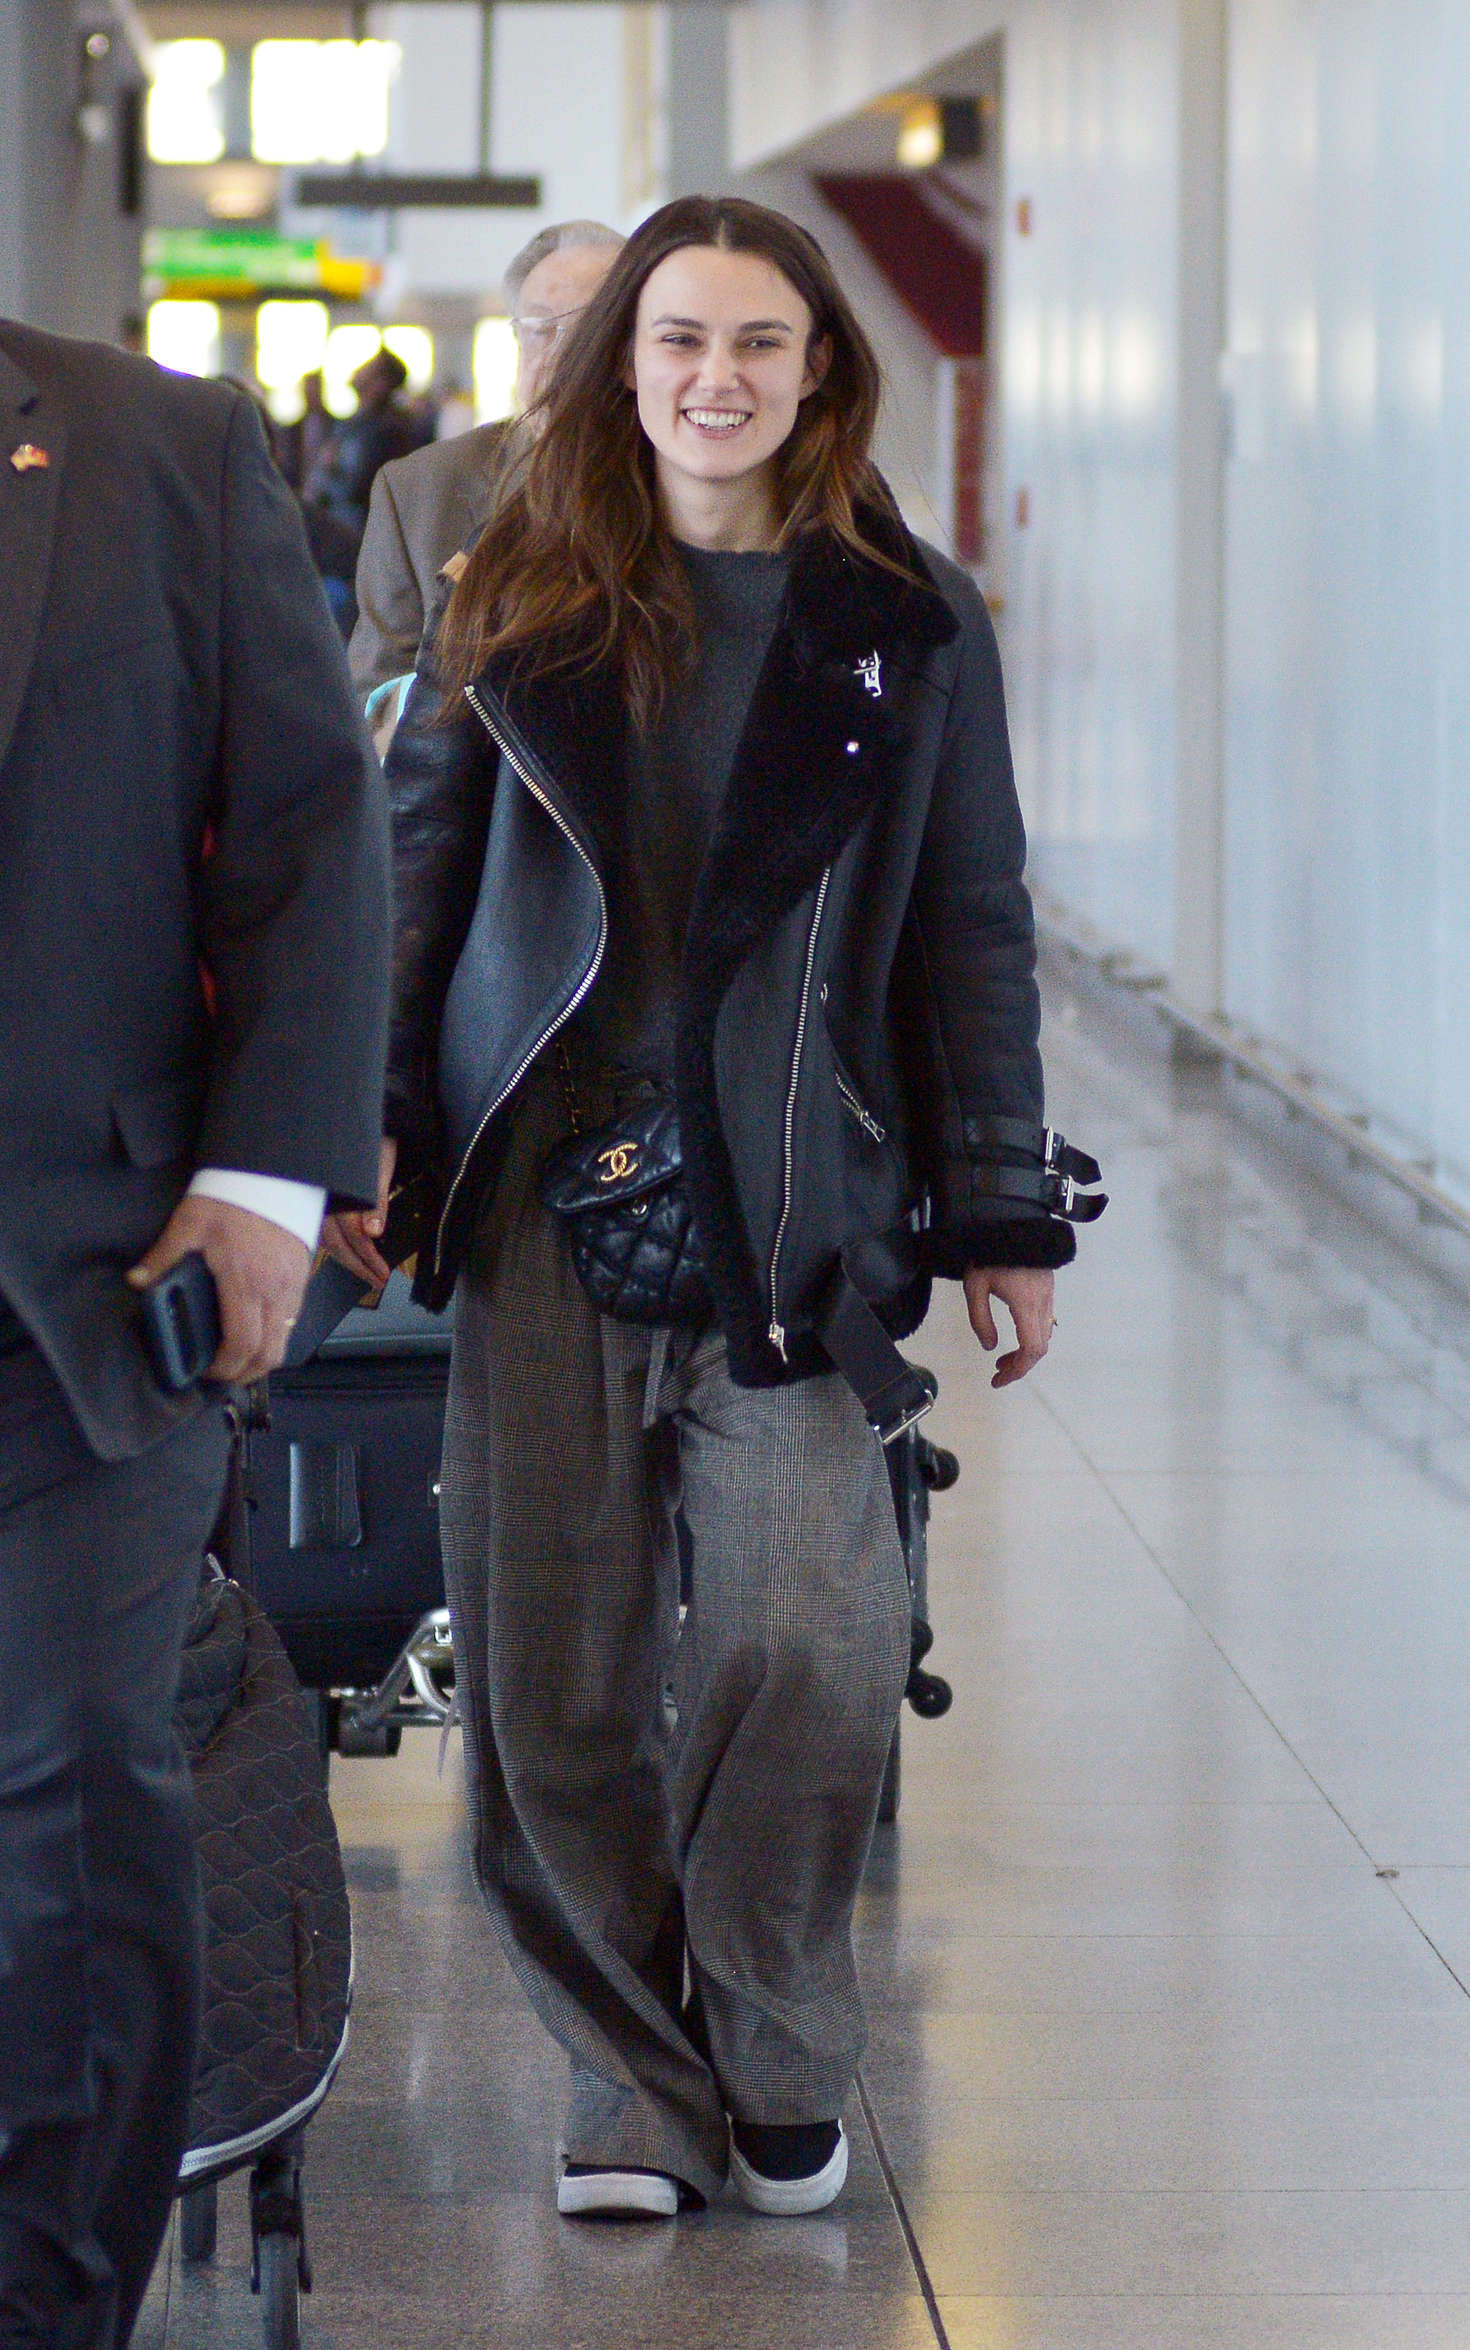 Keira Knightley 2016 : Keira Knightley: Arrives at JFK Airport -02